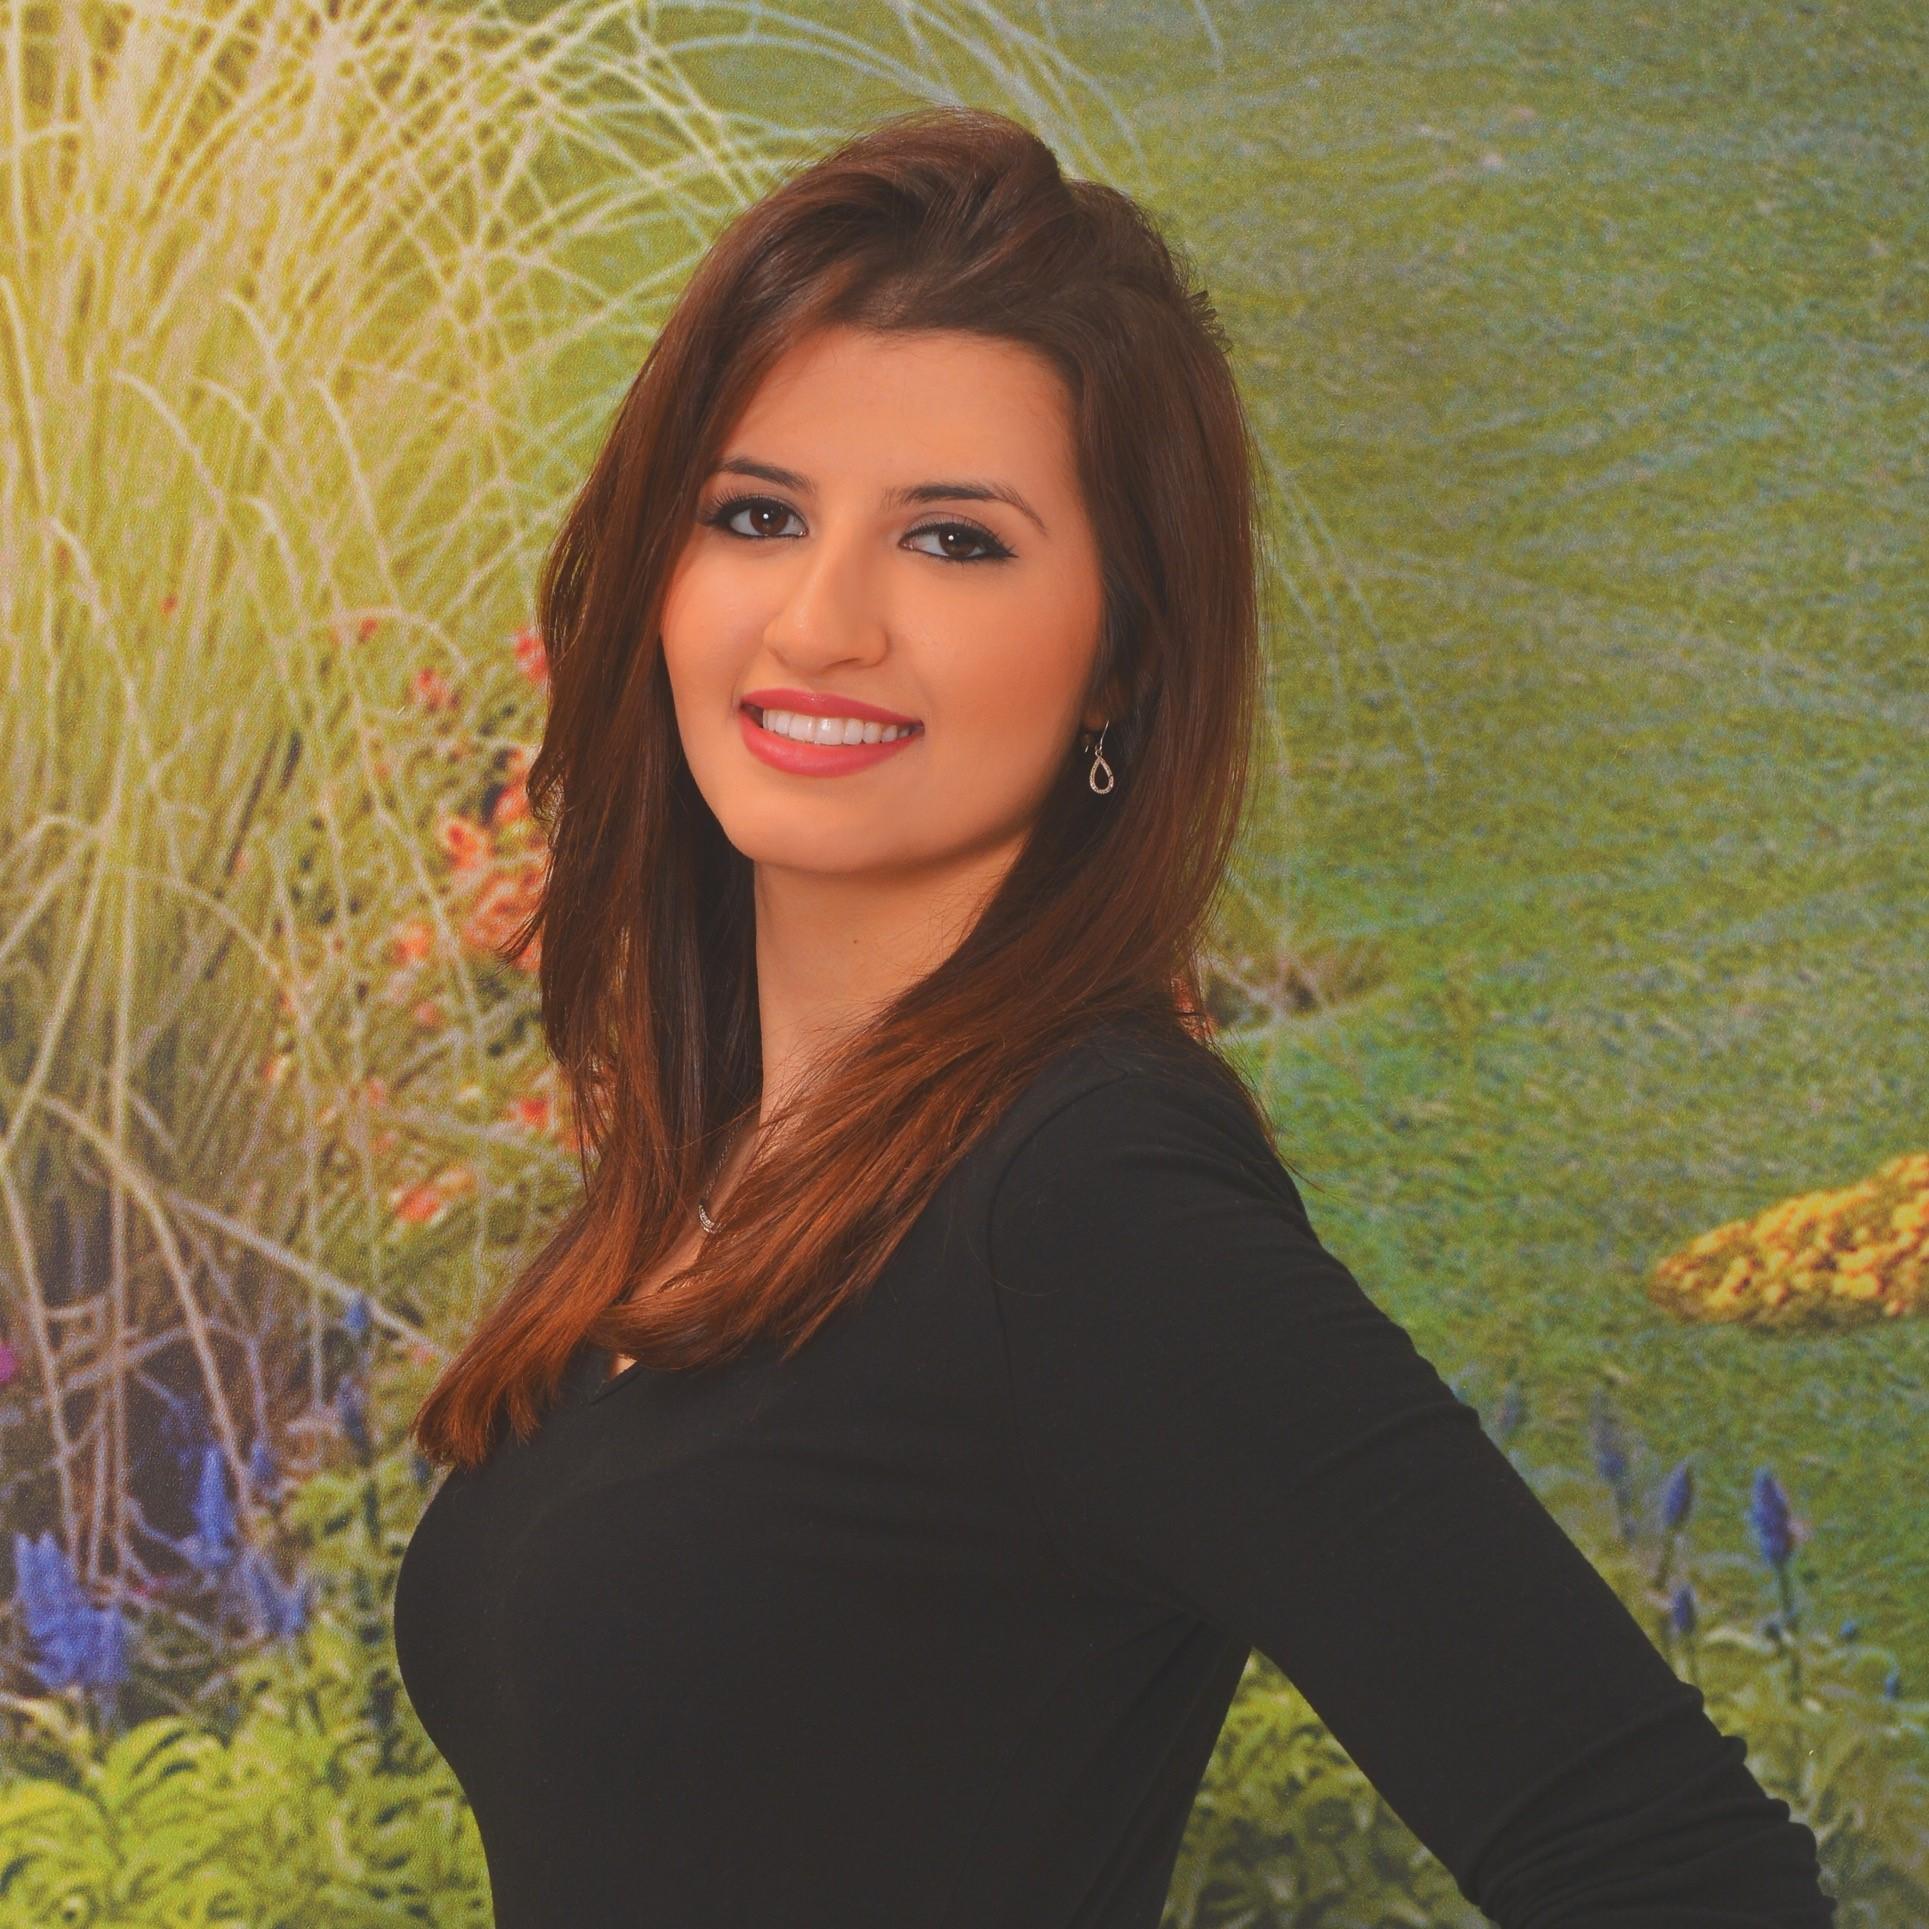 Fay Al-Hakim